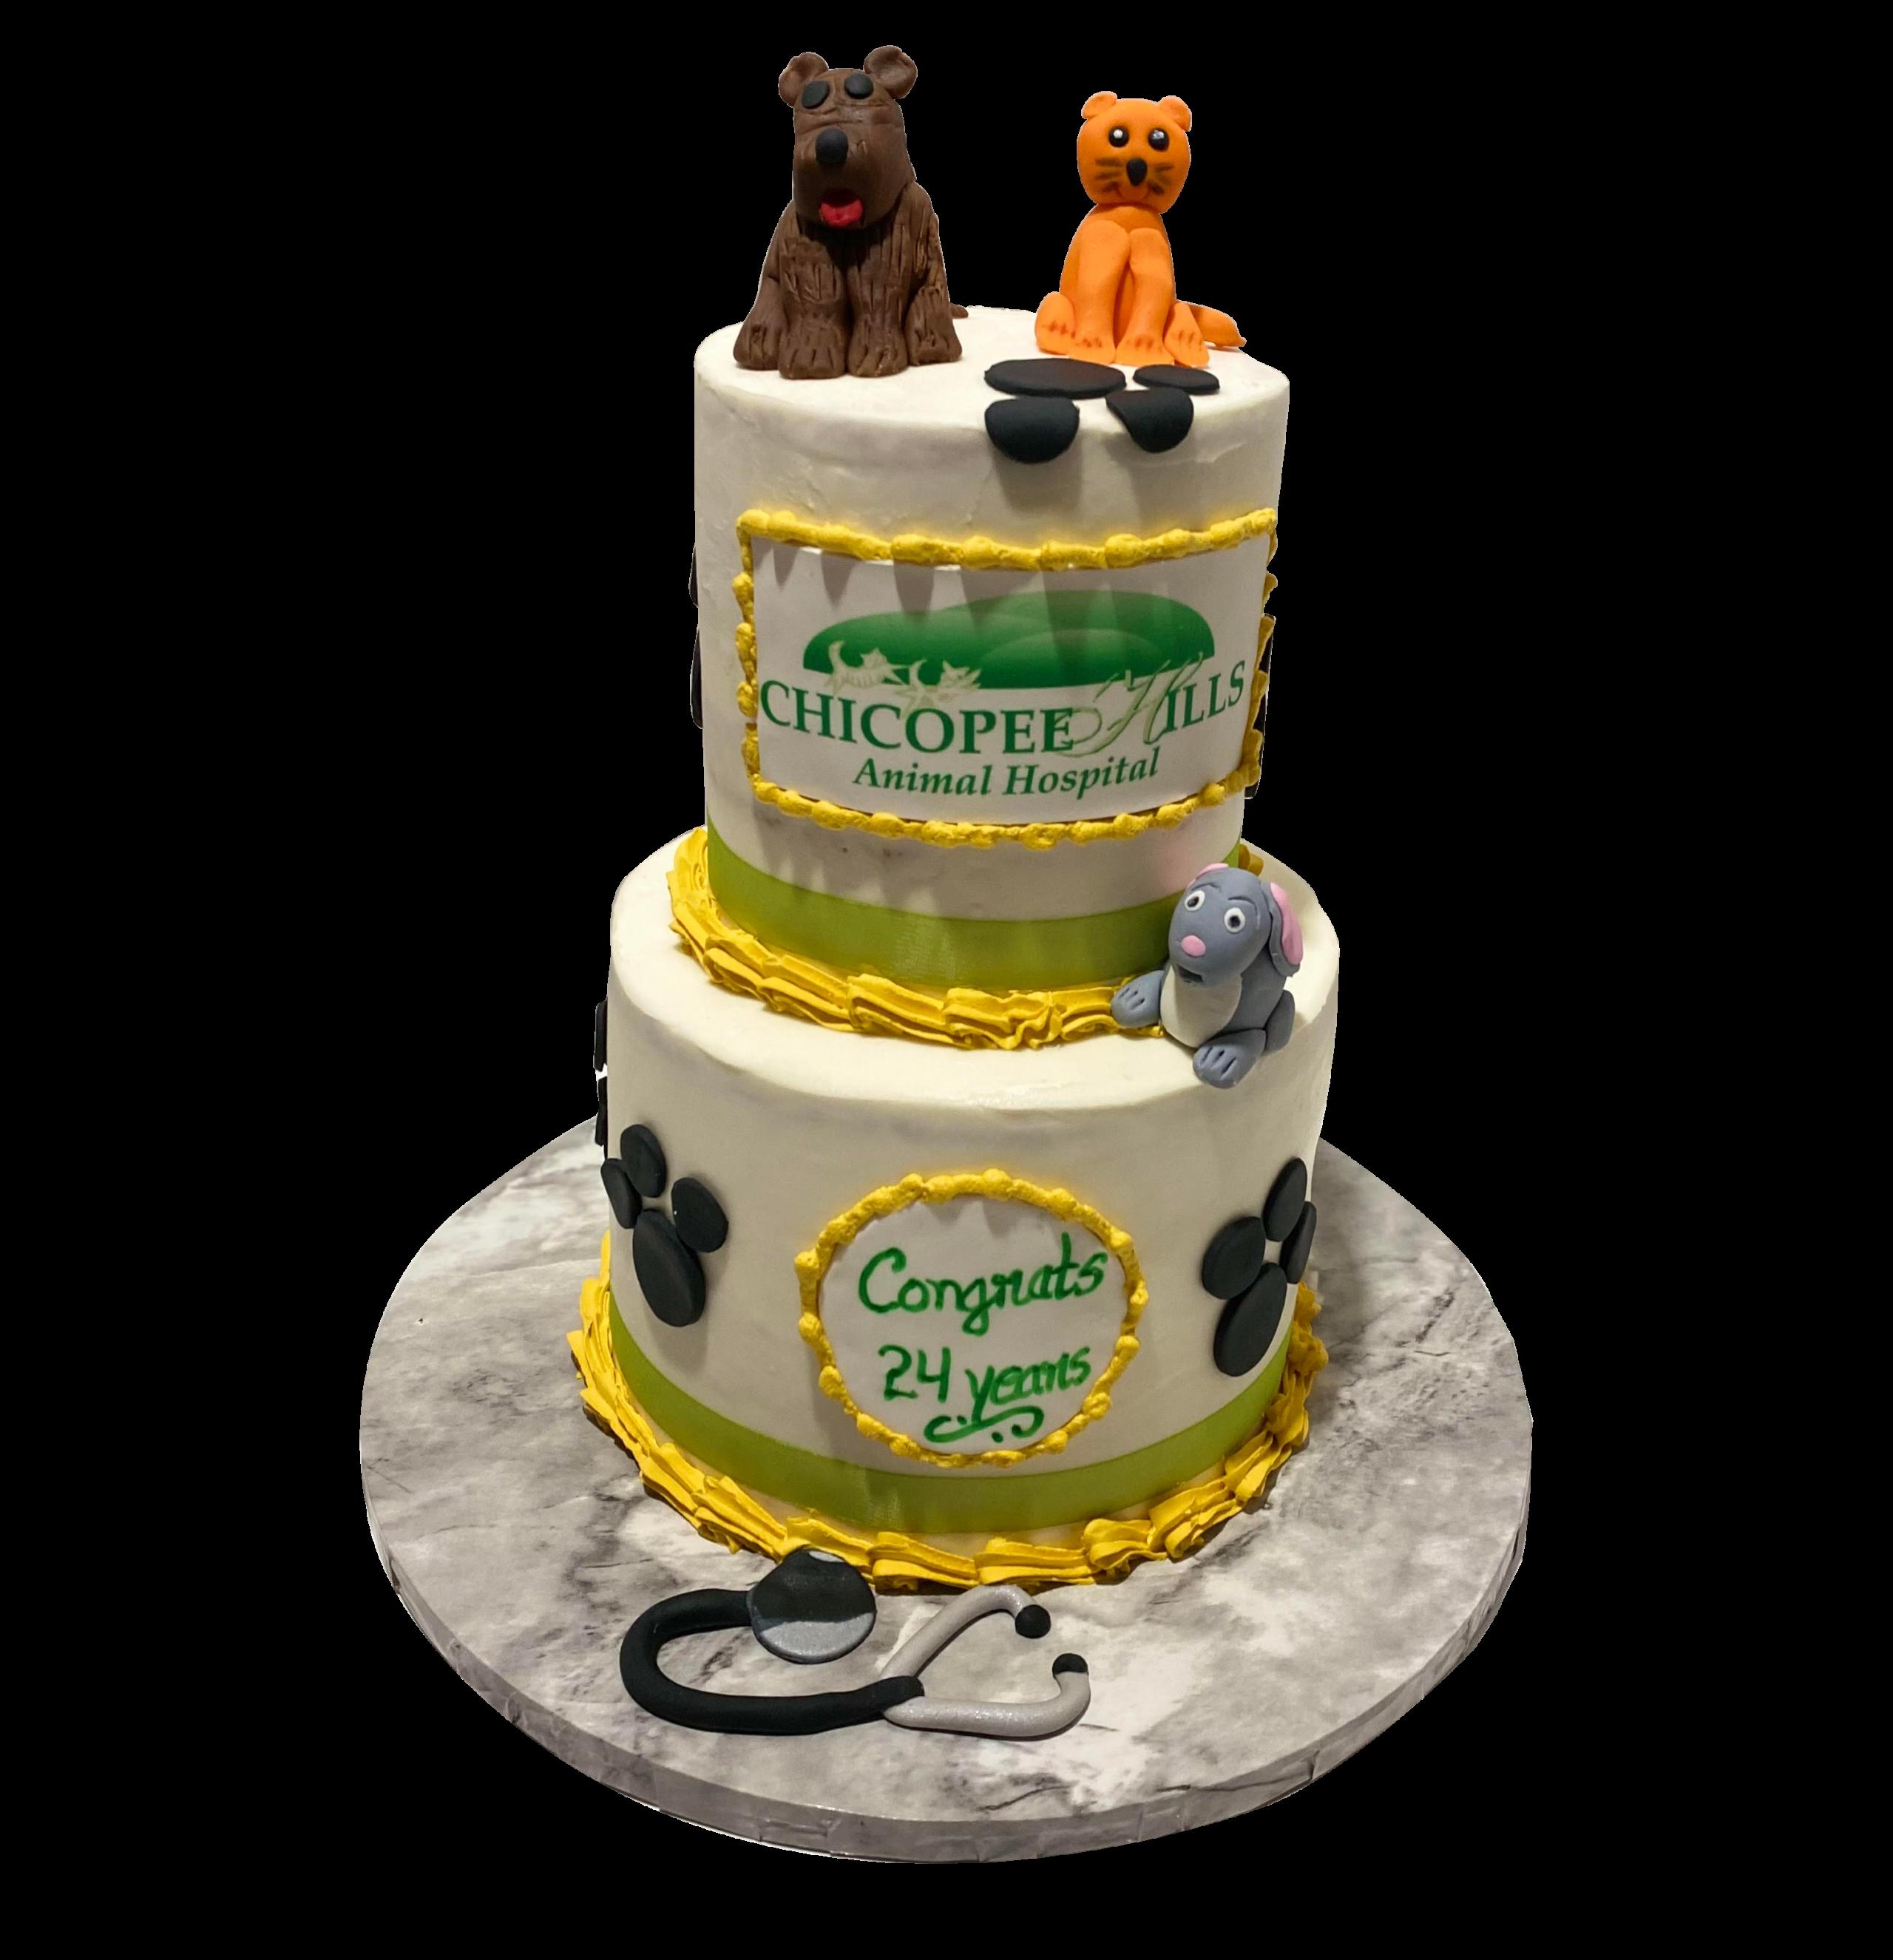 Animal Hospital Anniversary cake